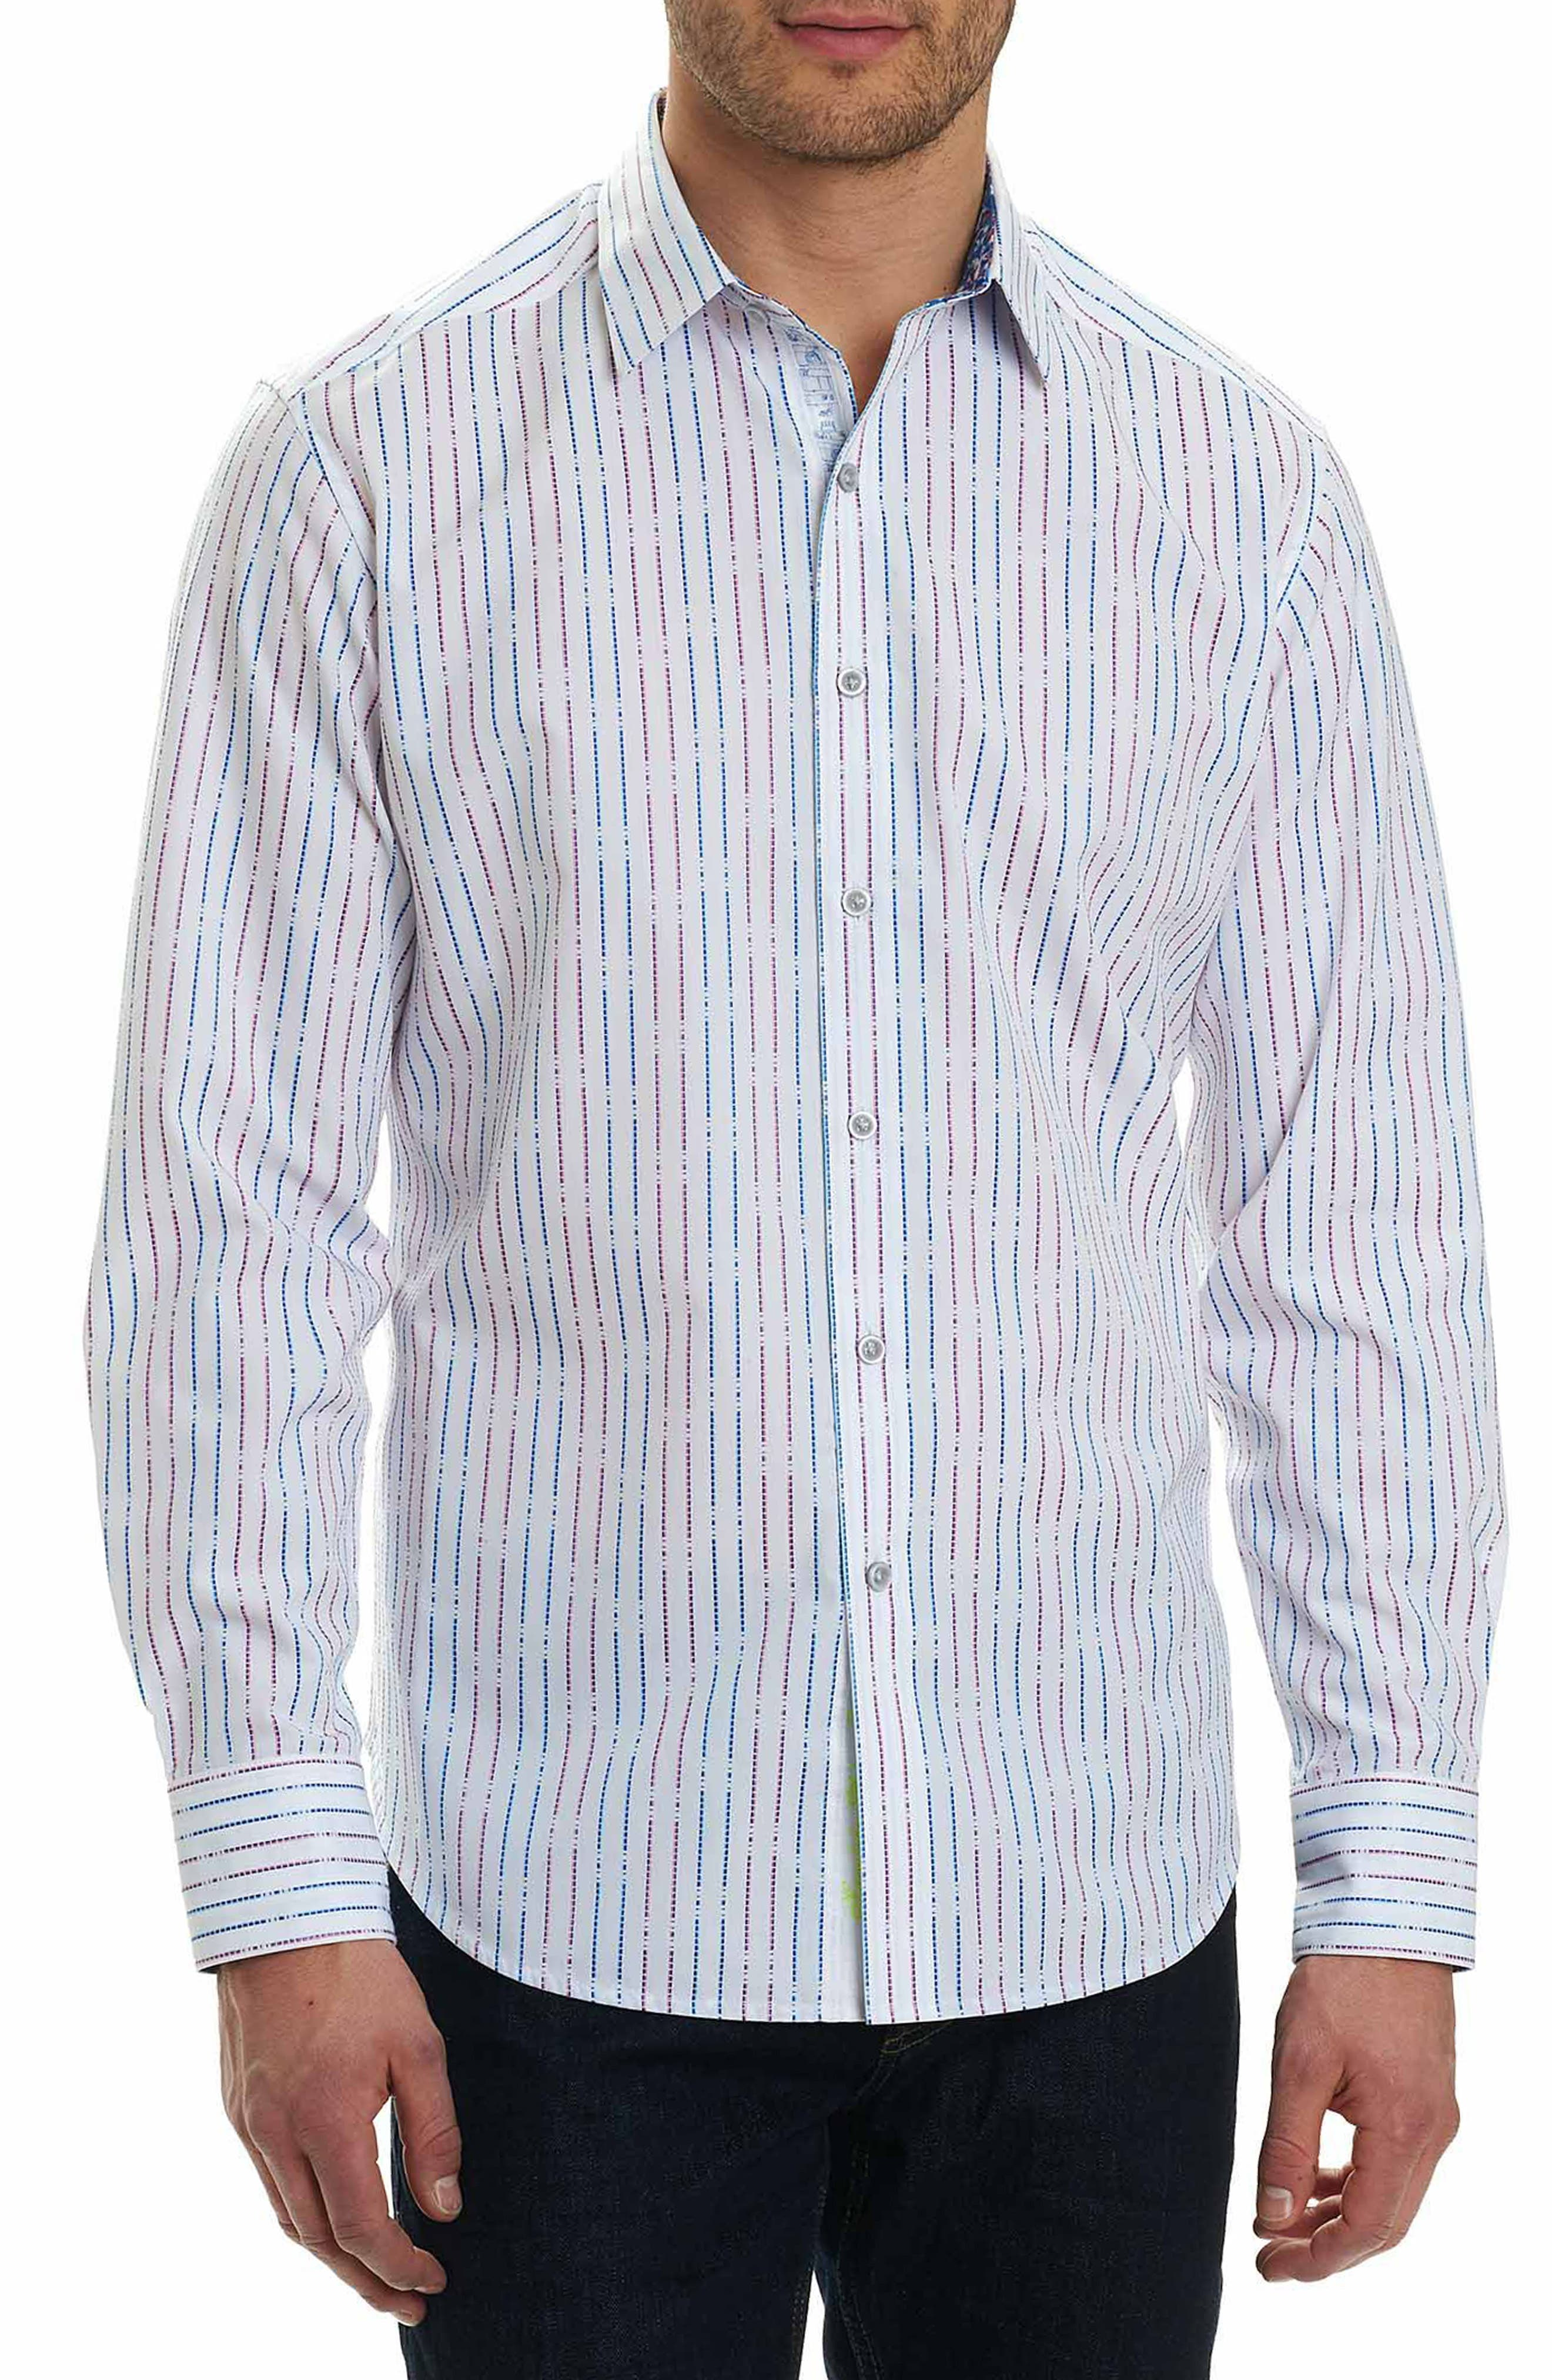 Bora Classic Fit Sport Shirt,                             Main thumbnail 1, color,                             100